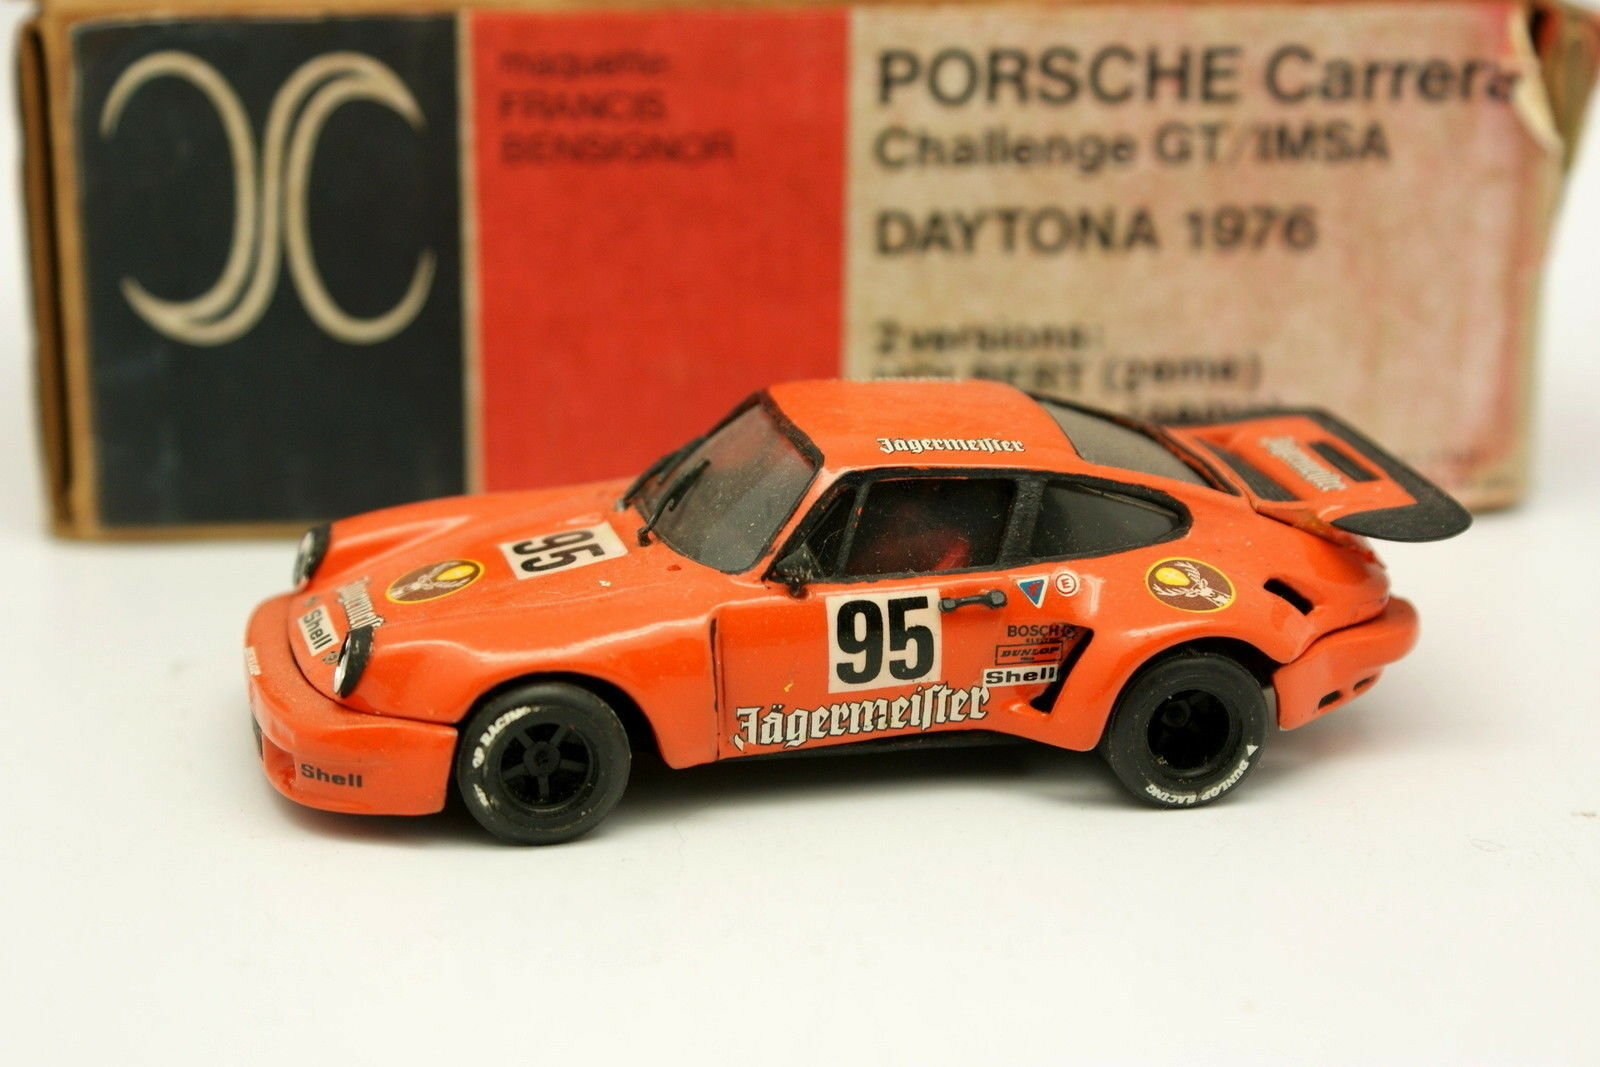 AMR 1/43 - Porsche 911 RSR 3.0 Jagermeister N 95 Daytona 1976